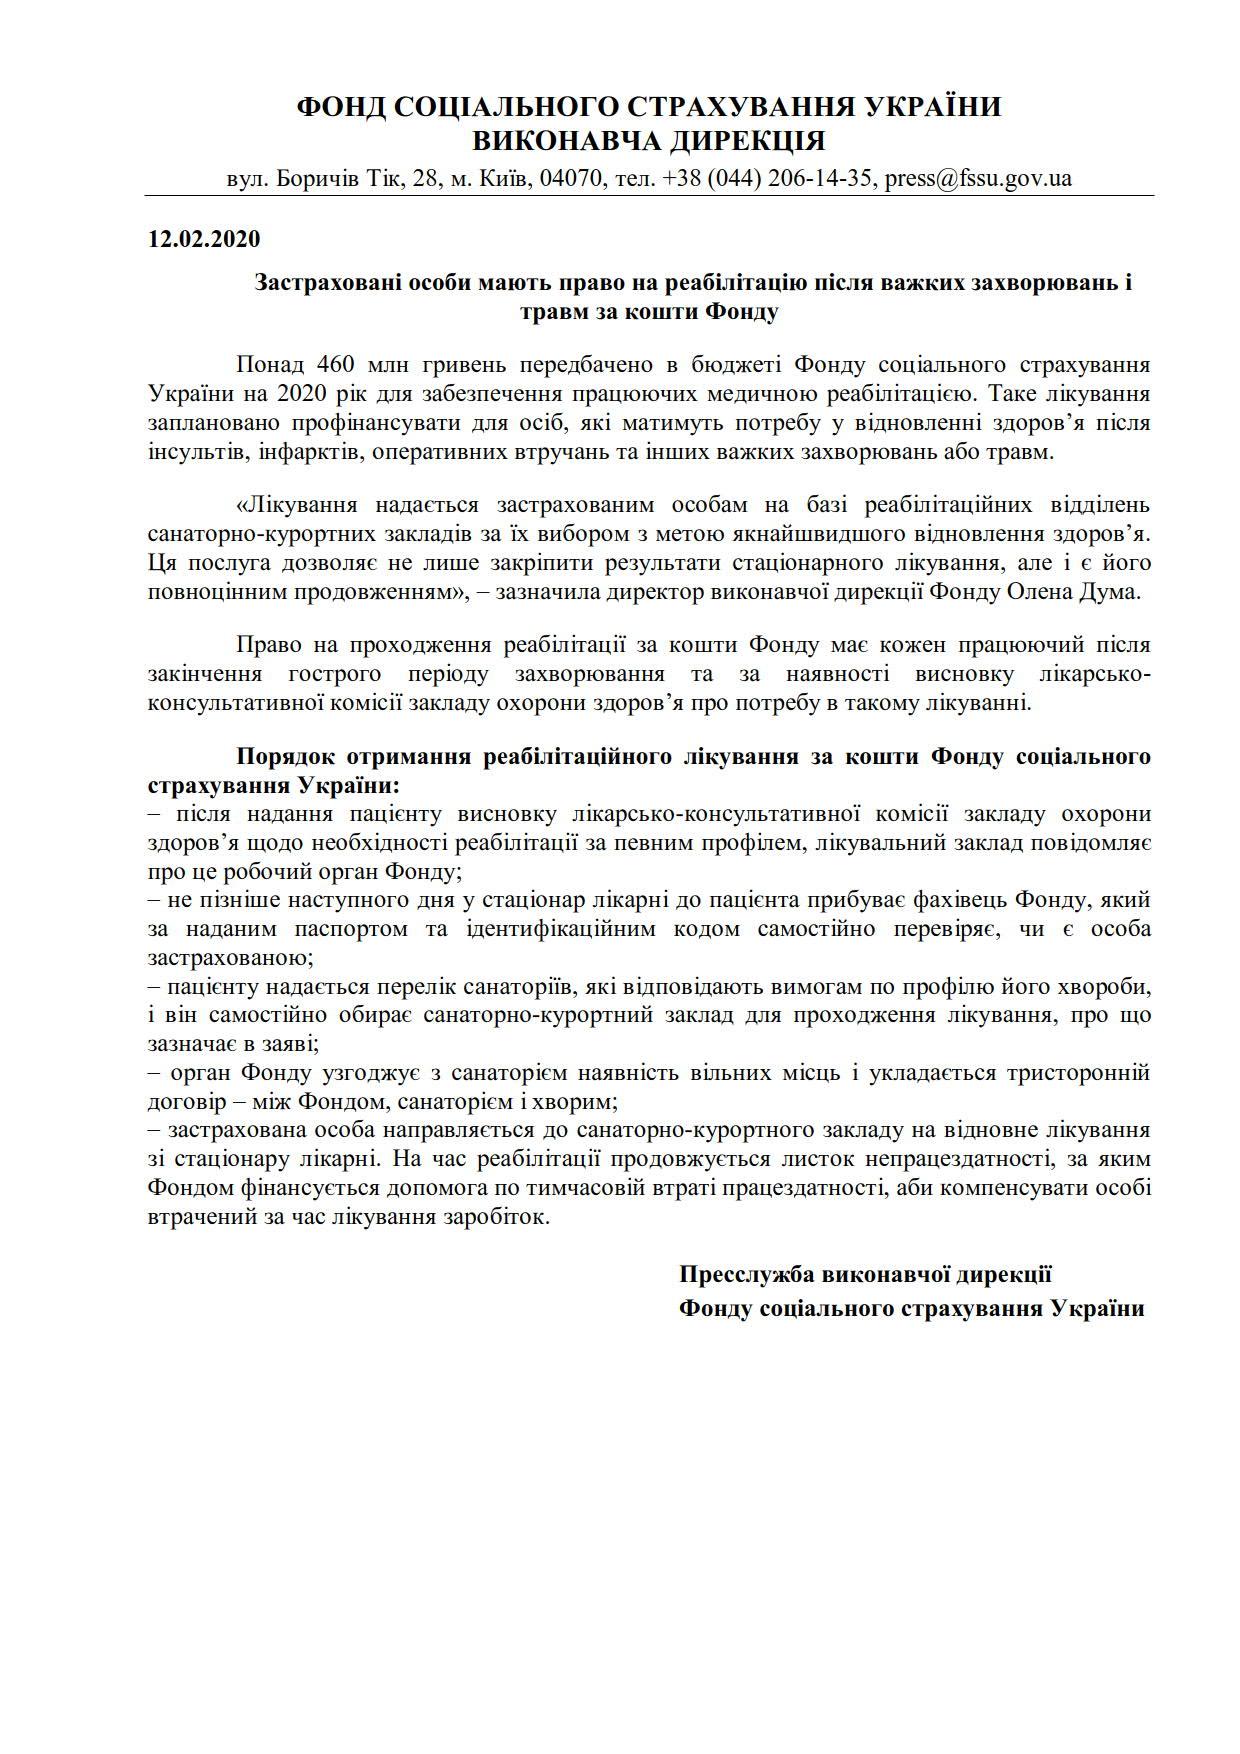 ФССУ_Право на реабілітацію2020_1